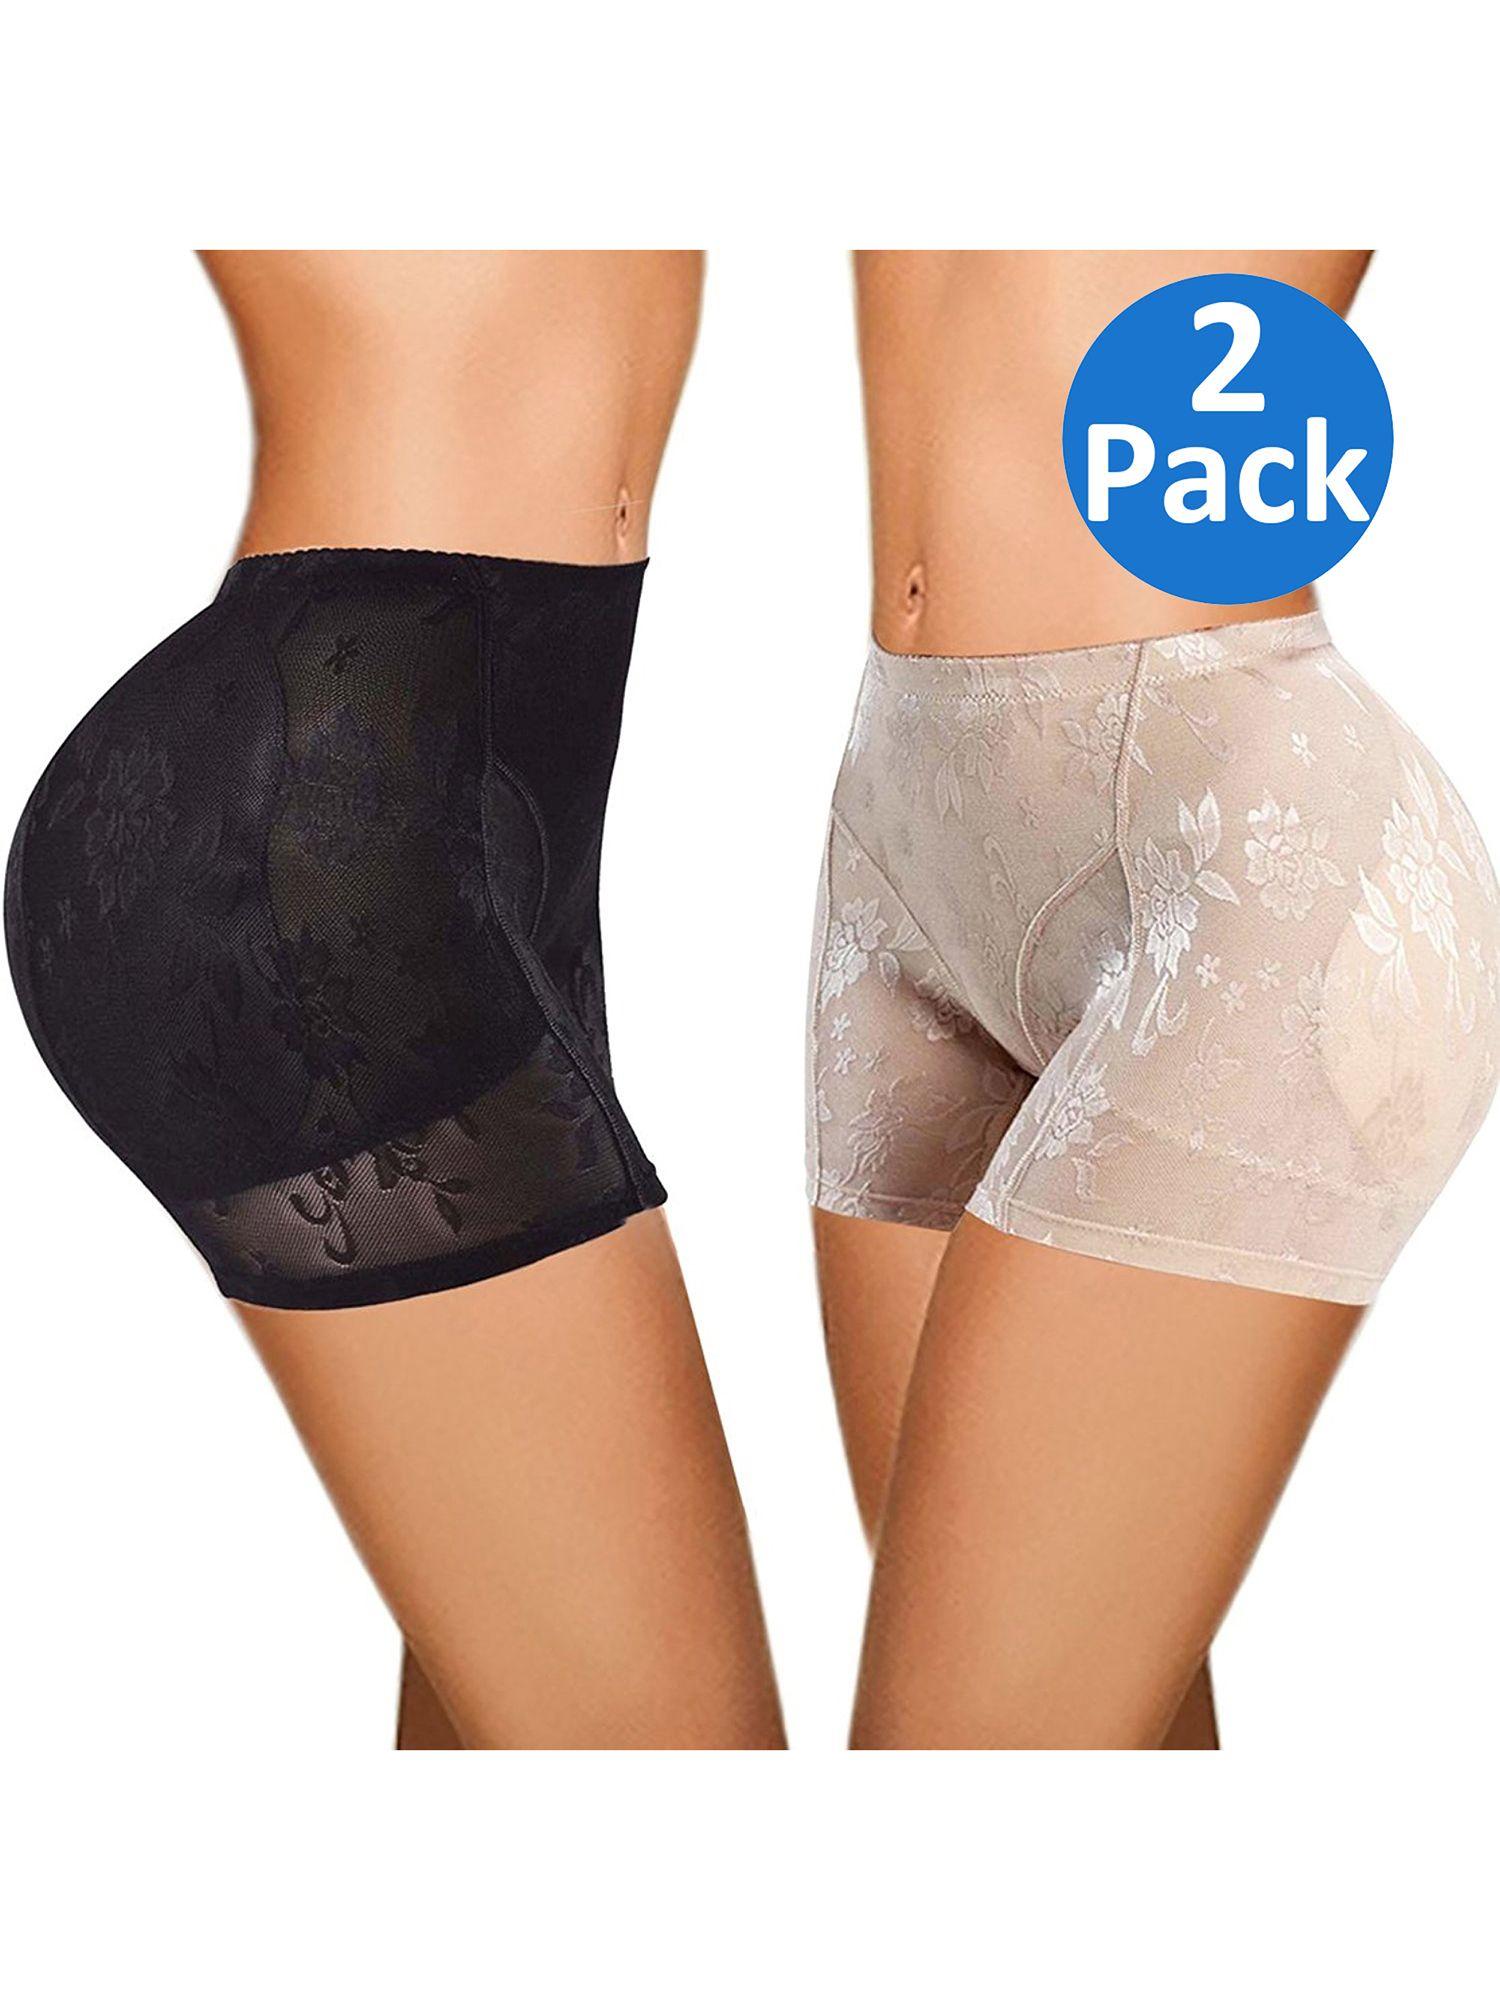 51a3e7087a56 SAYFUT Butt Lifter Padded Panty Enhancing Body Shaper for Women Shapewear  Boyshorts Control Panties Black Nude Plus Size#Enhancing, #Panty, #Shaper